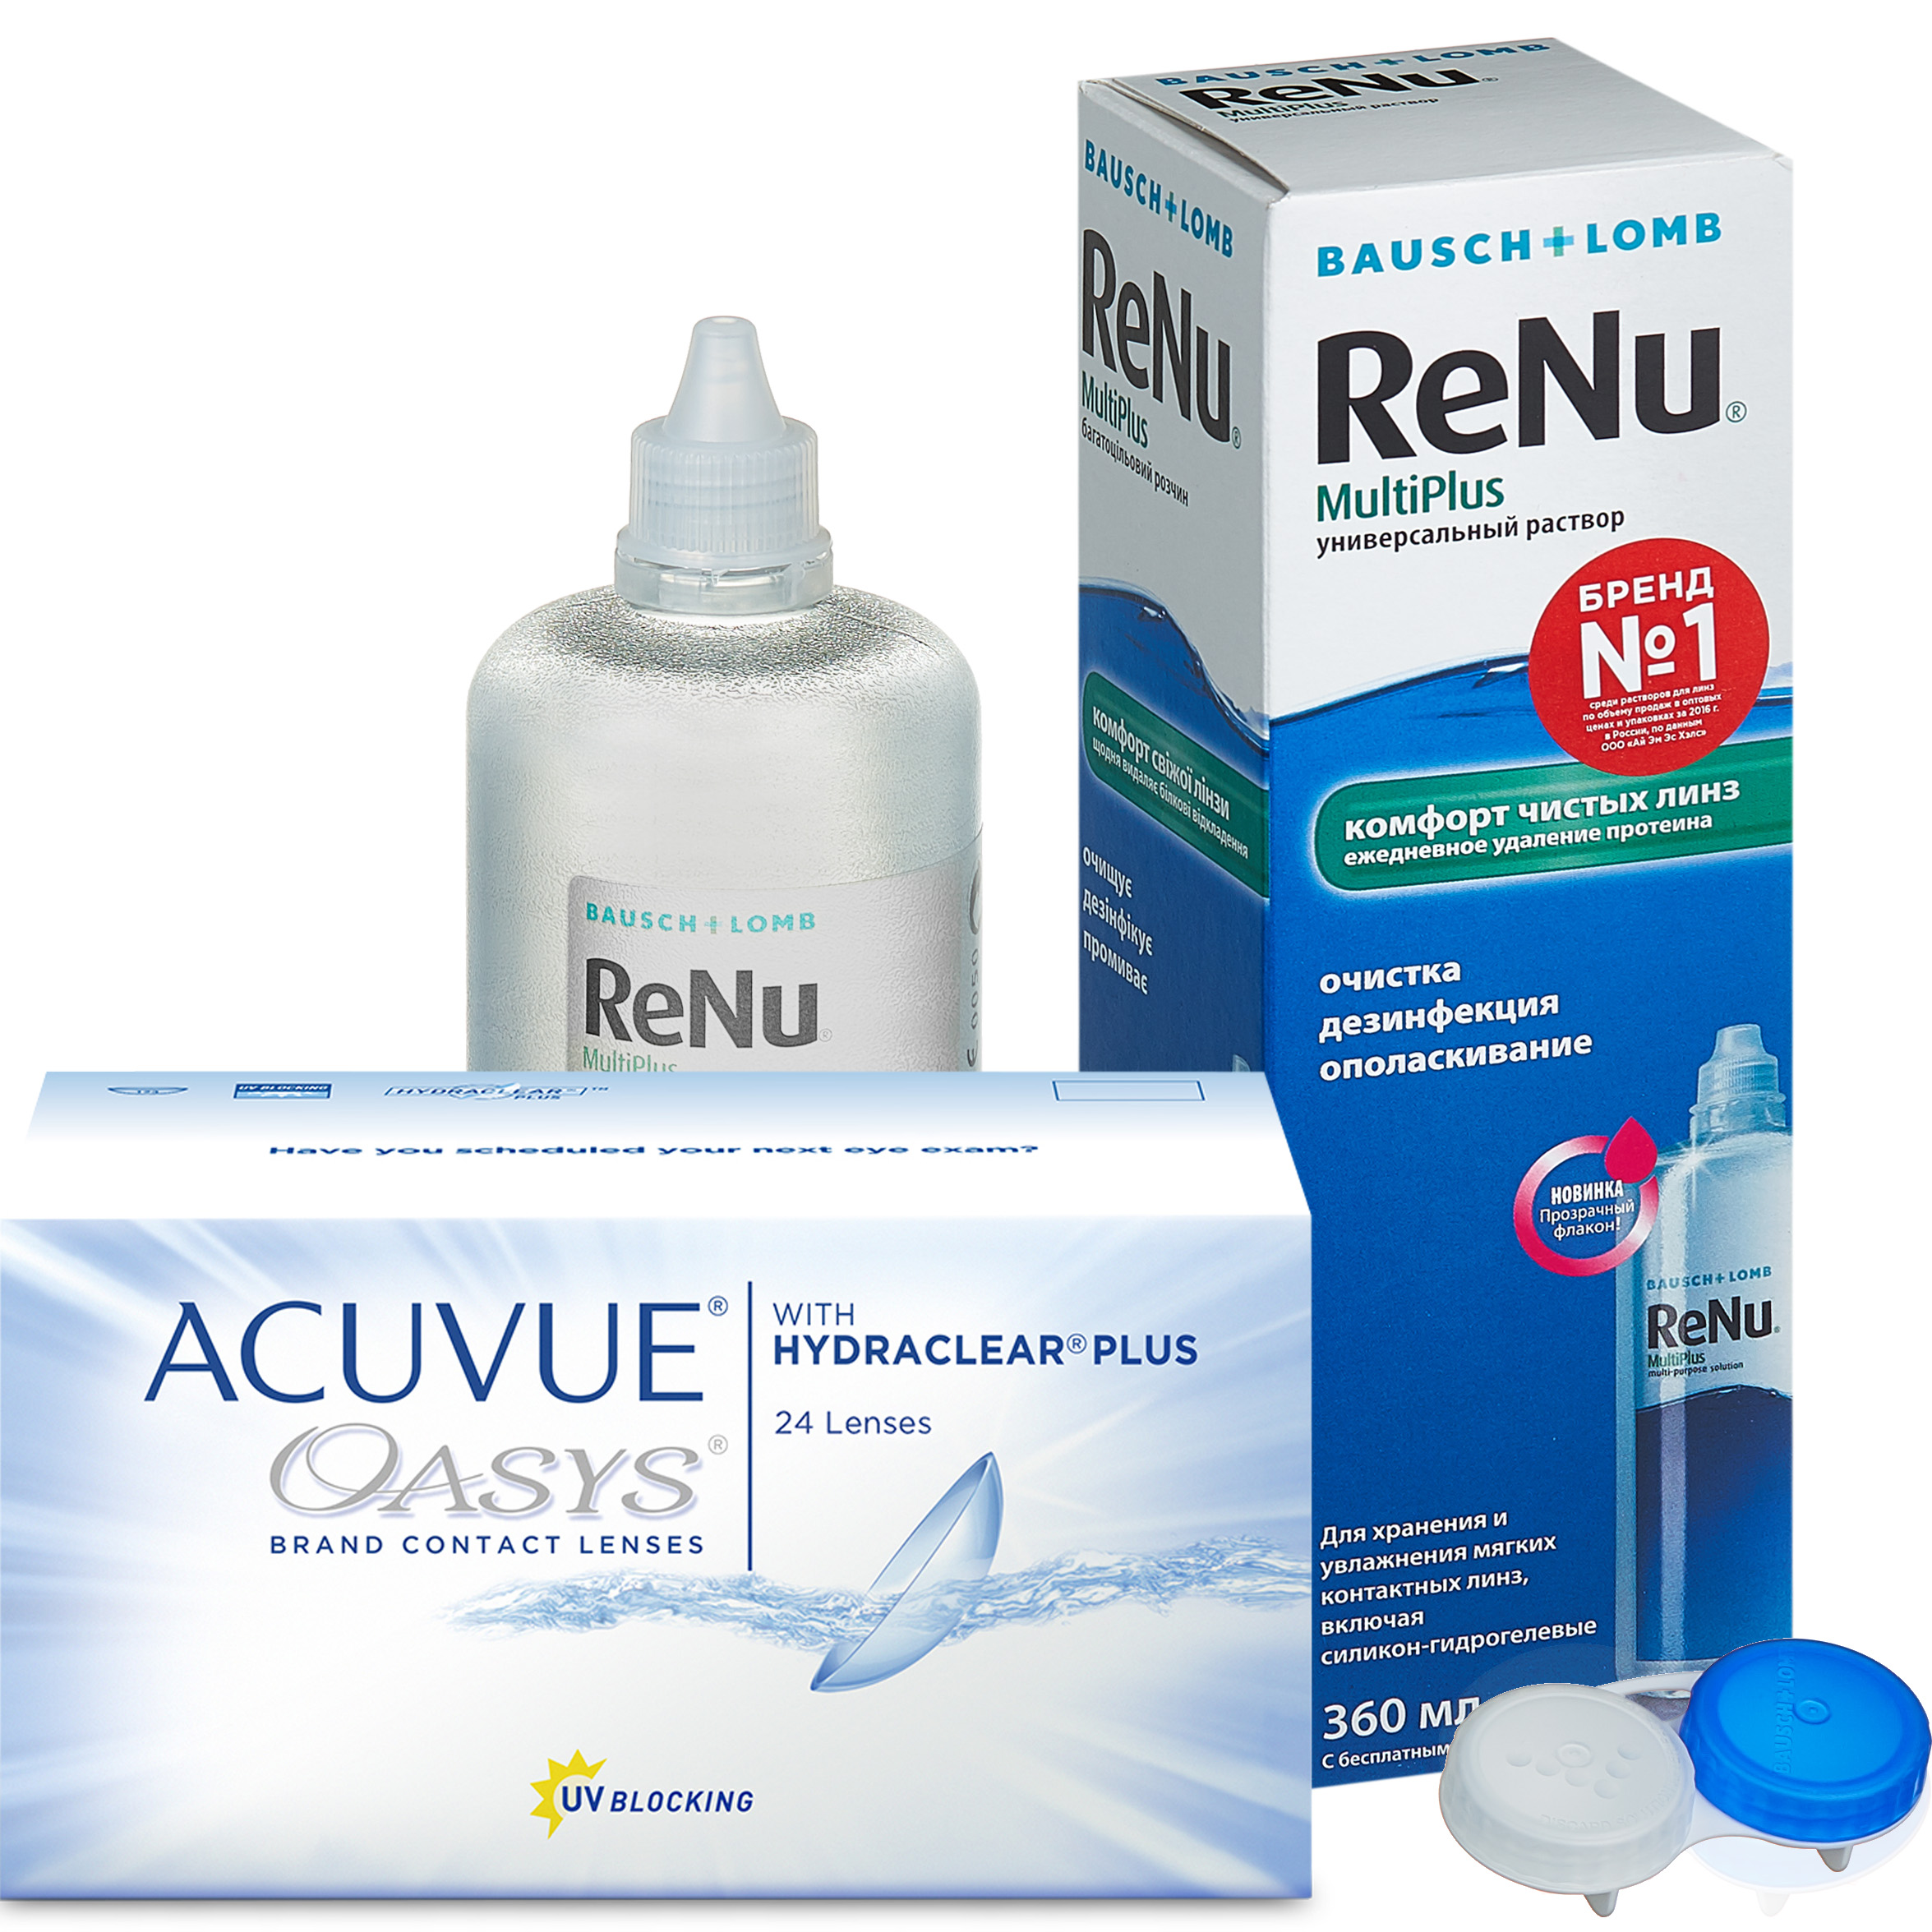 Купить Oasys with Hydraclear Plus 24 линзы + ReNu MultiPlus, Линзы Acuvue Oasys with Hydraclear Plus 24 линзы R 8.8 +8, 00 + ReNu Multi Plus 360 мл